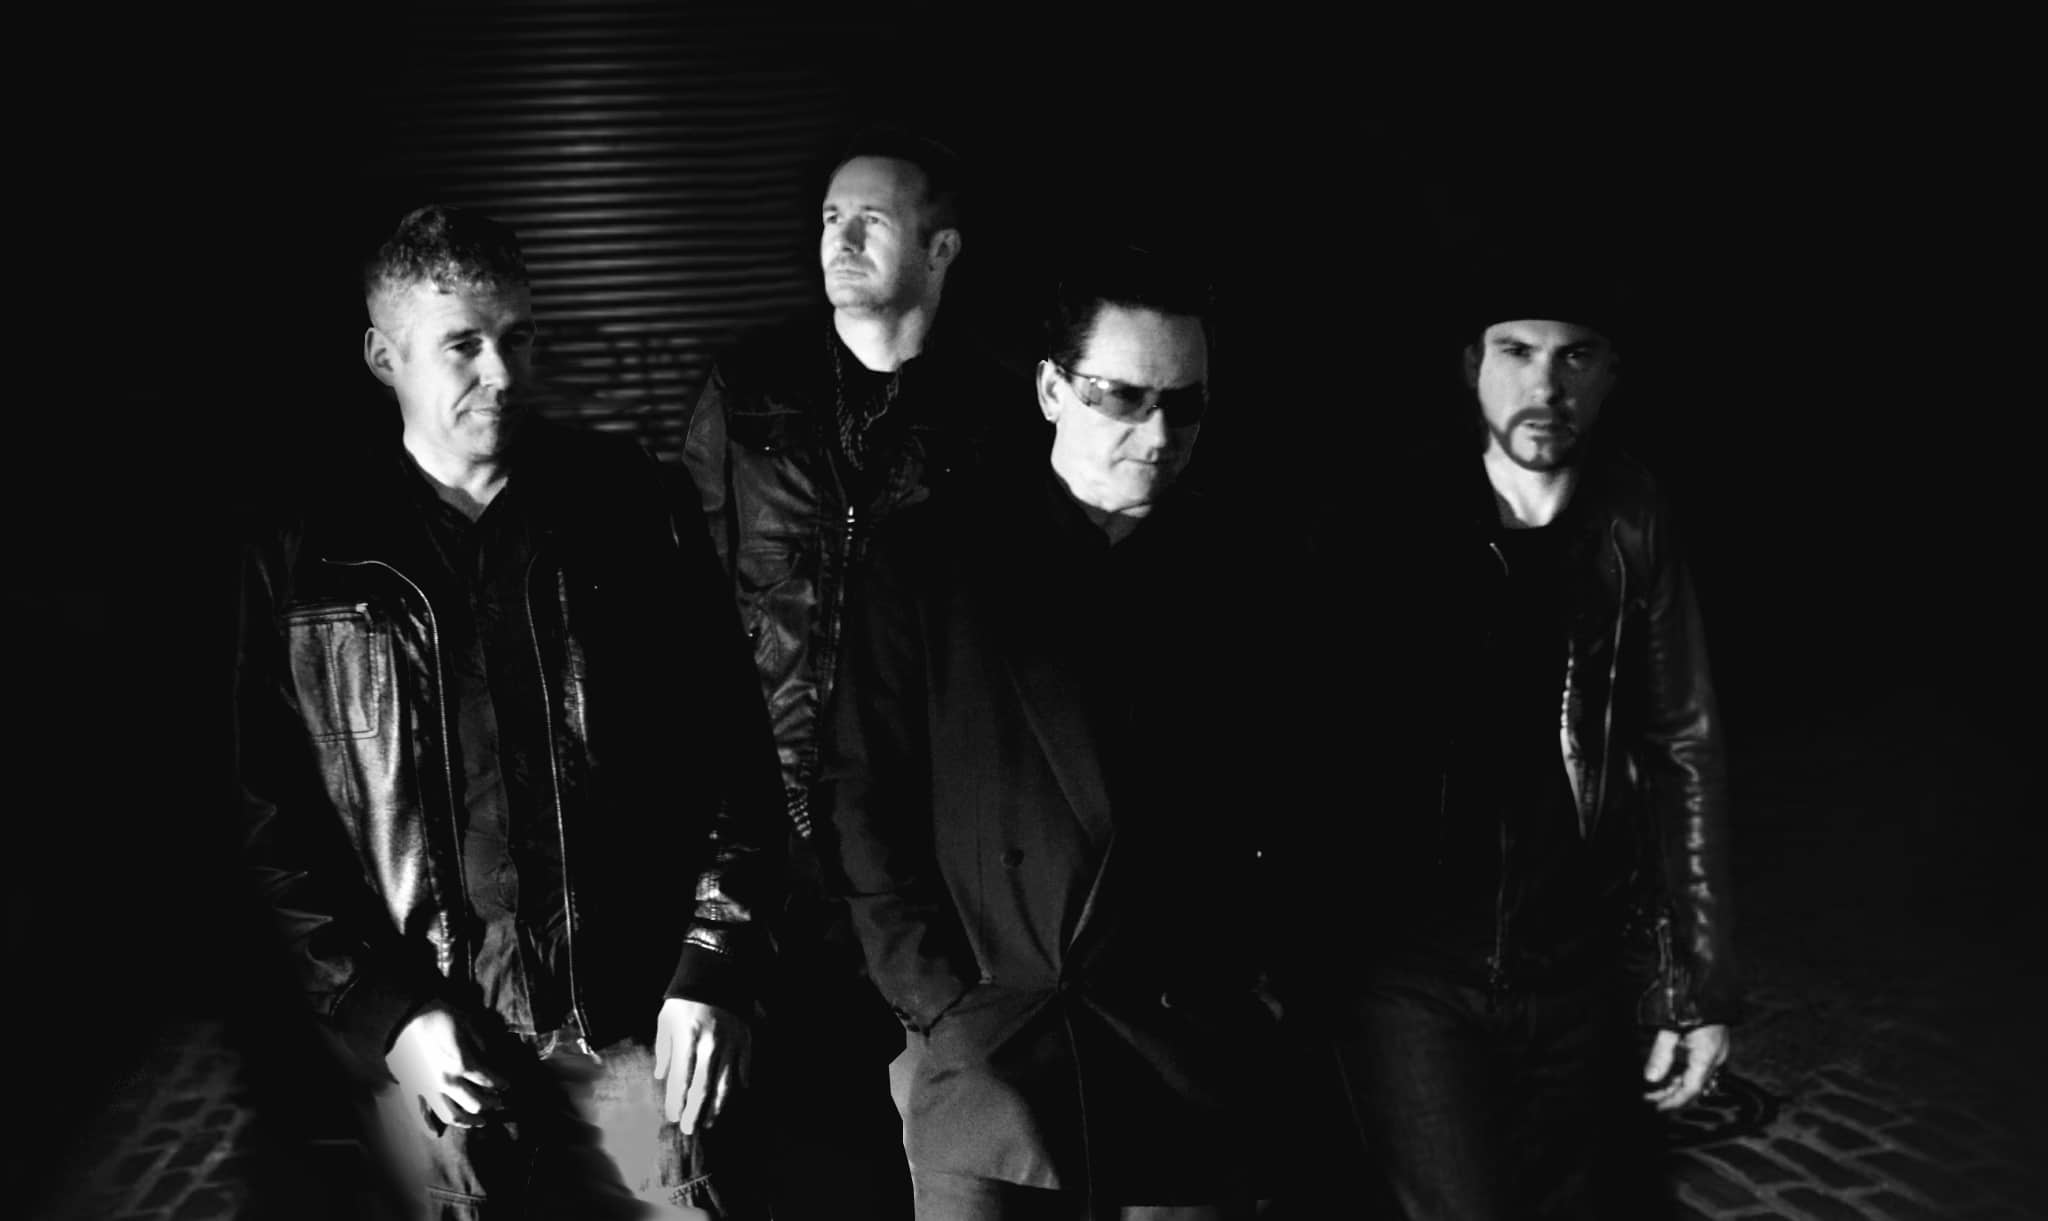 U2 Tribute Band Rattle & Hum